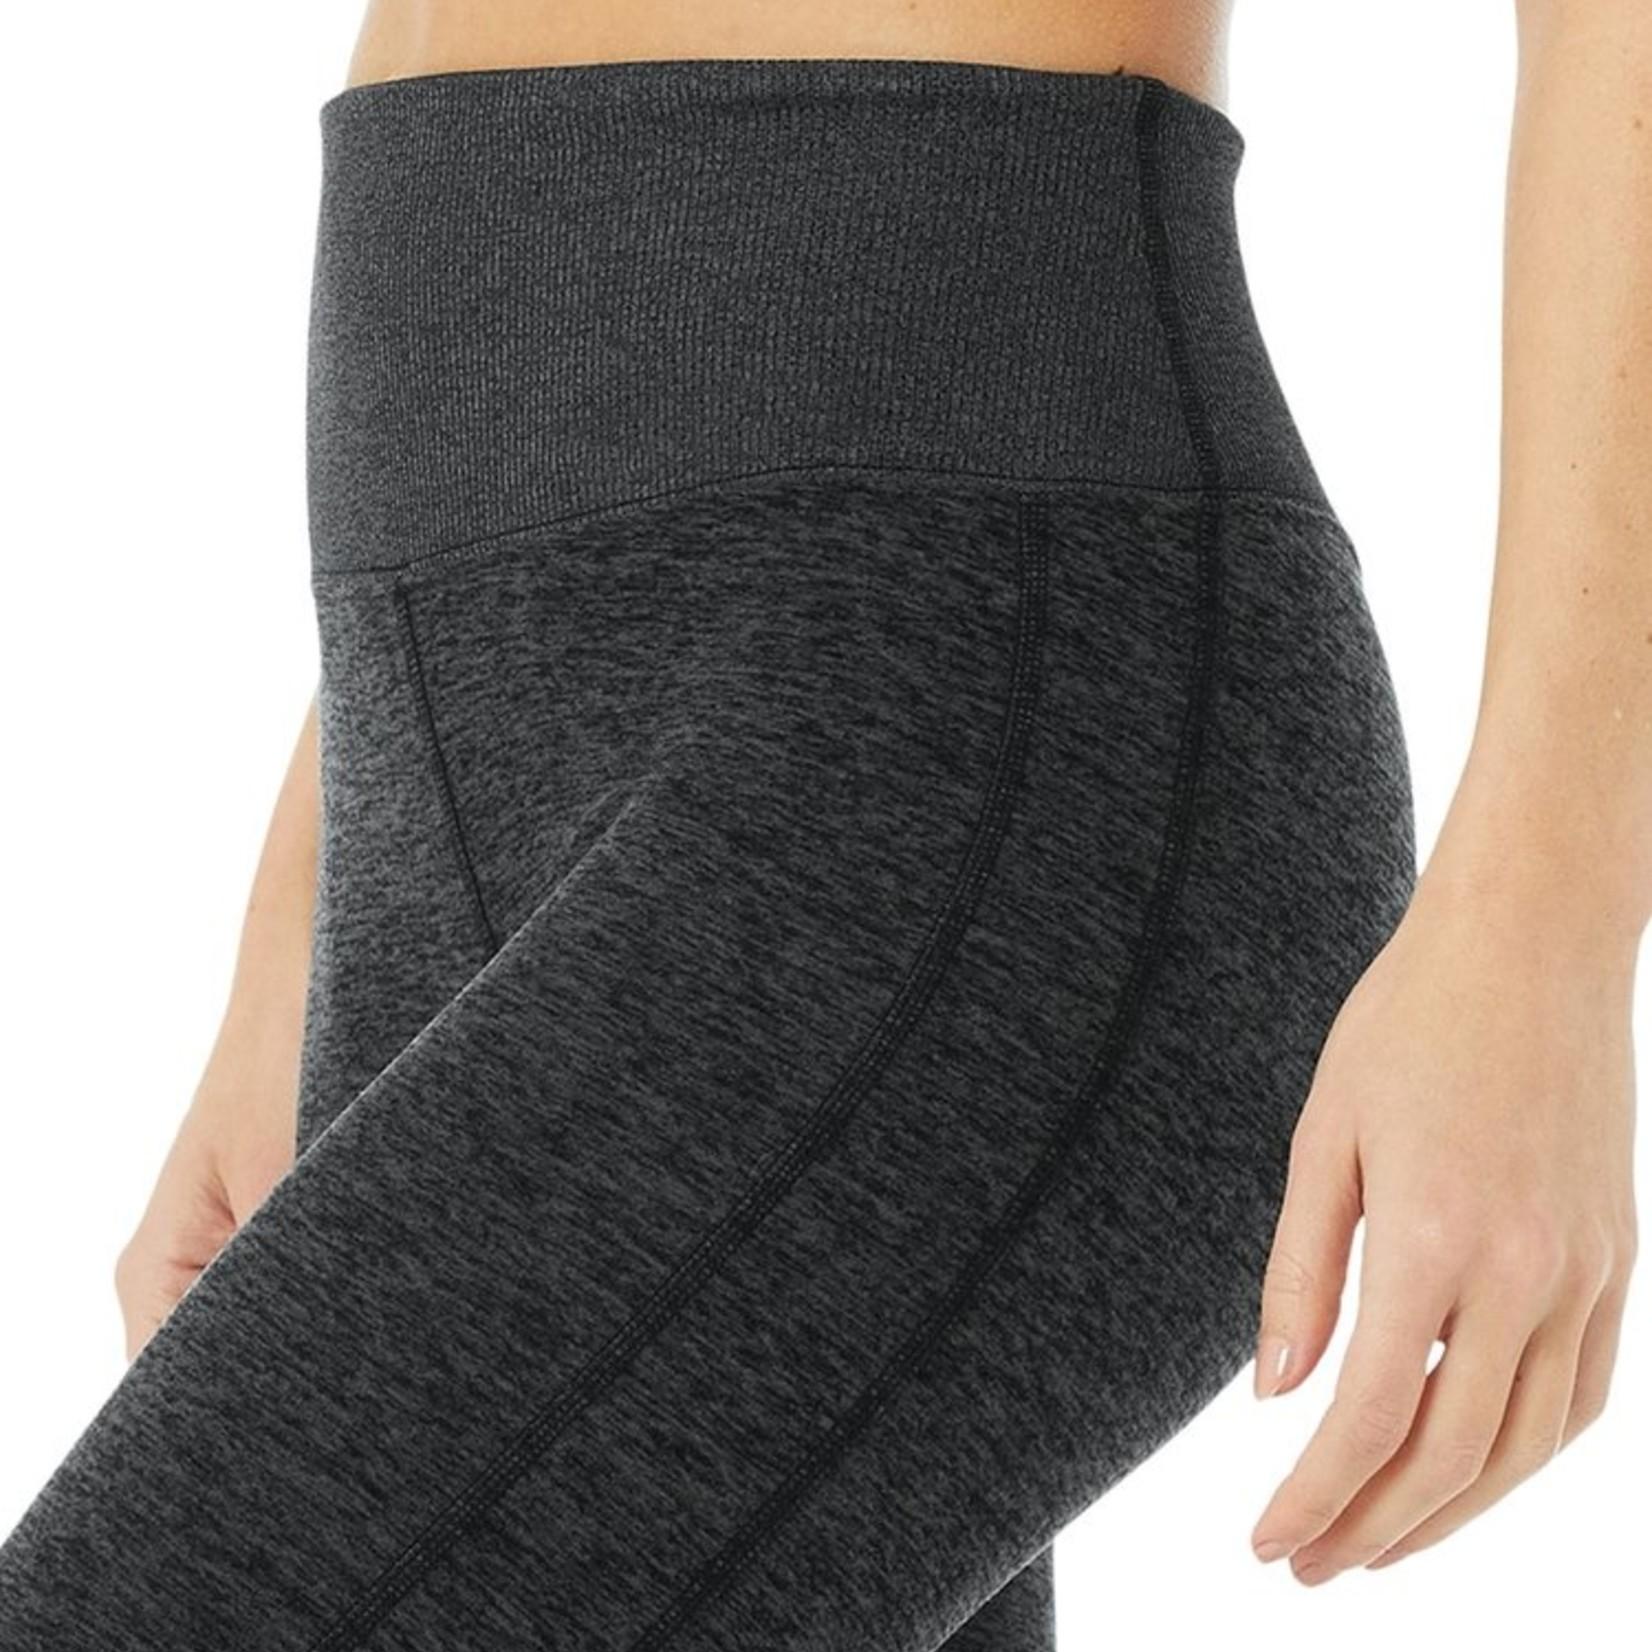 Alo Yoga Alo High Waist Alosoft Lounge Legging